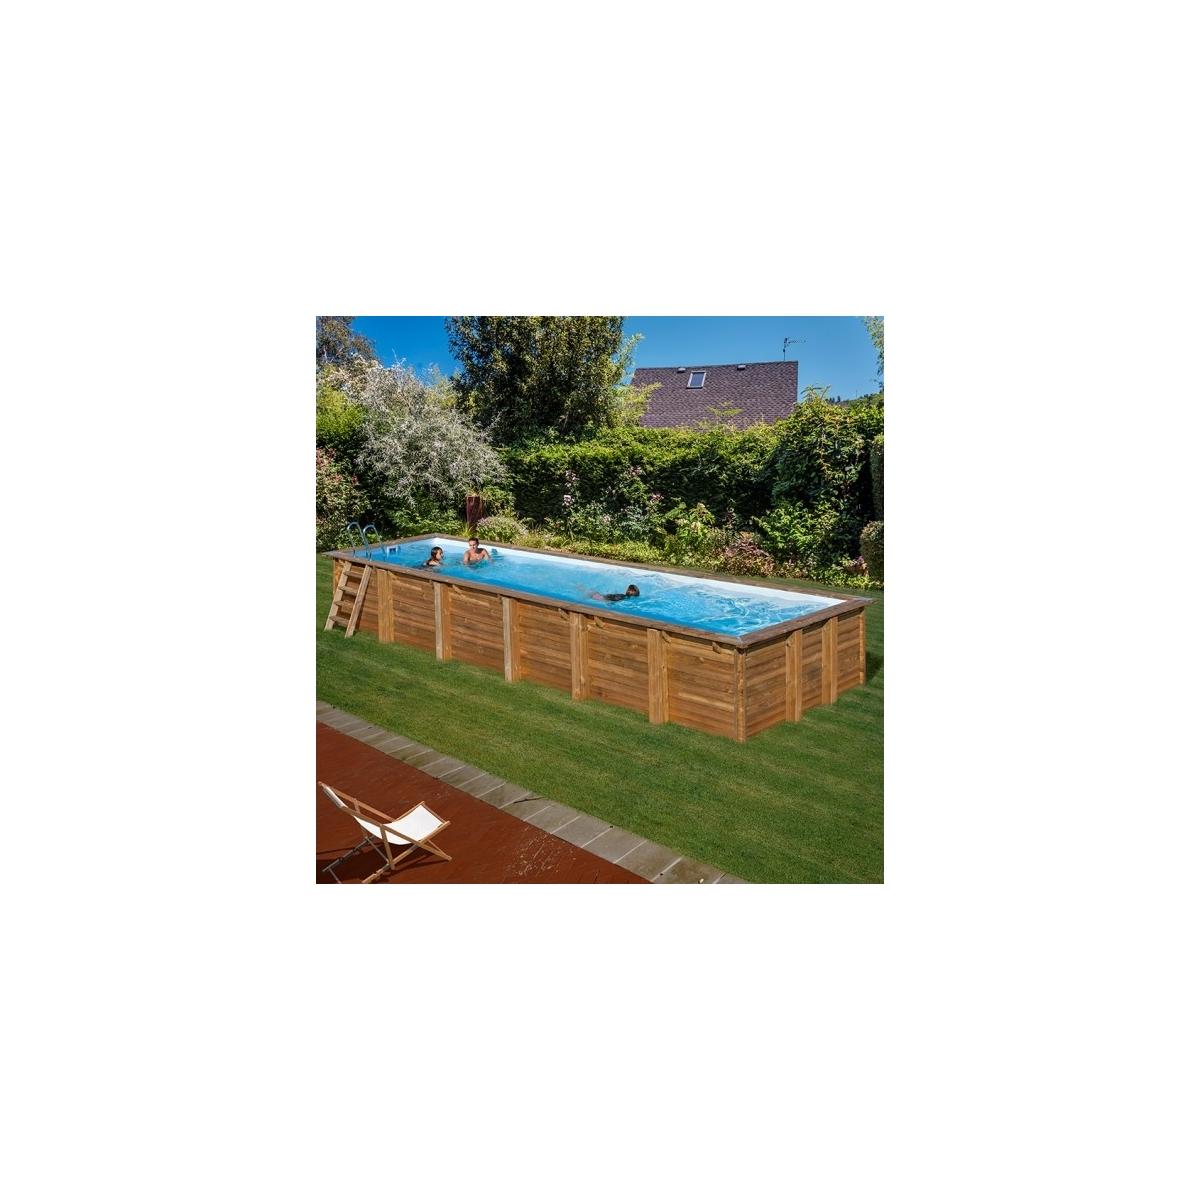 Piscina desmontable de madera Gre Sunbay Anise rectangular 910x318x146